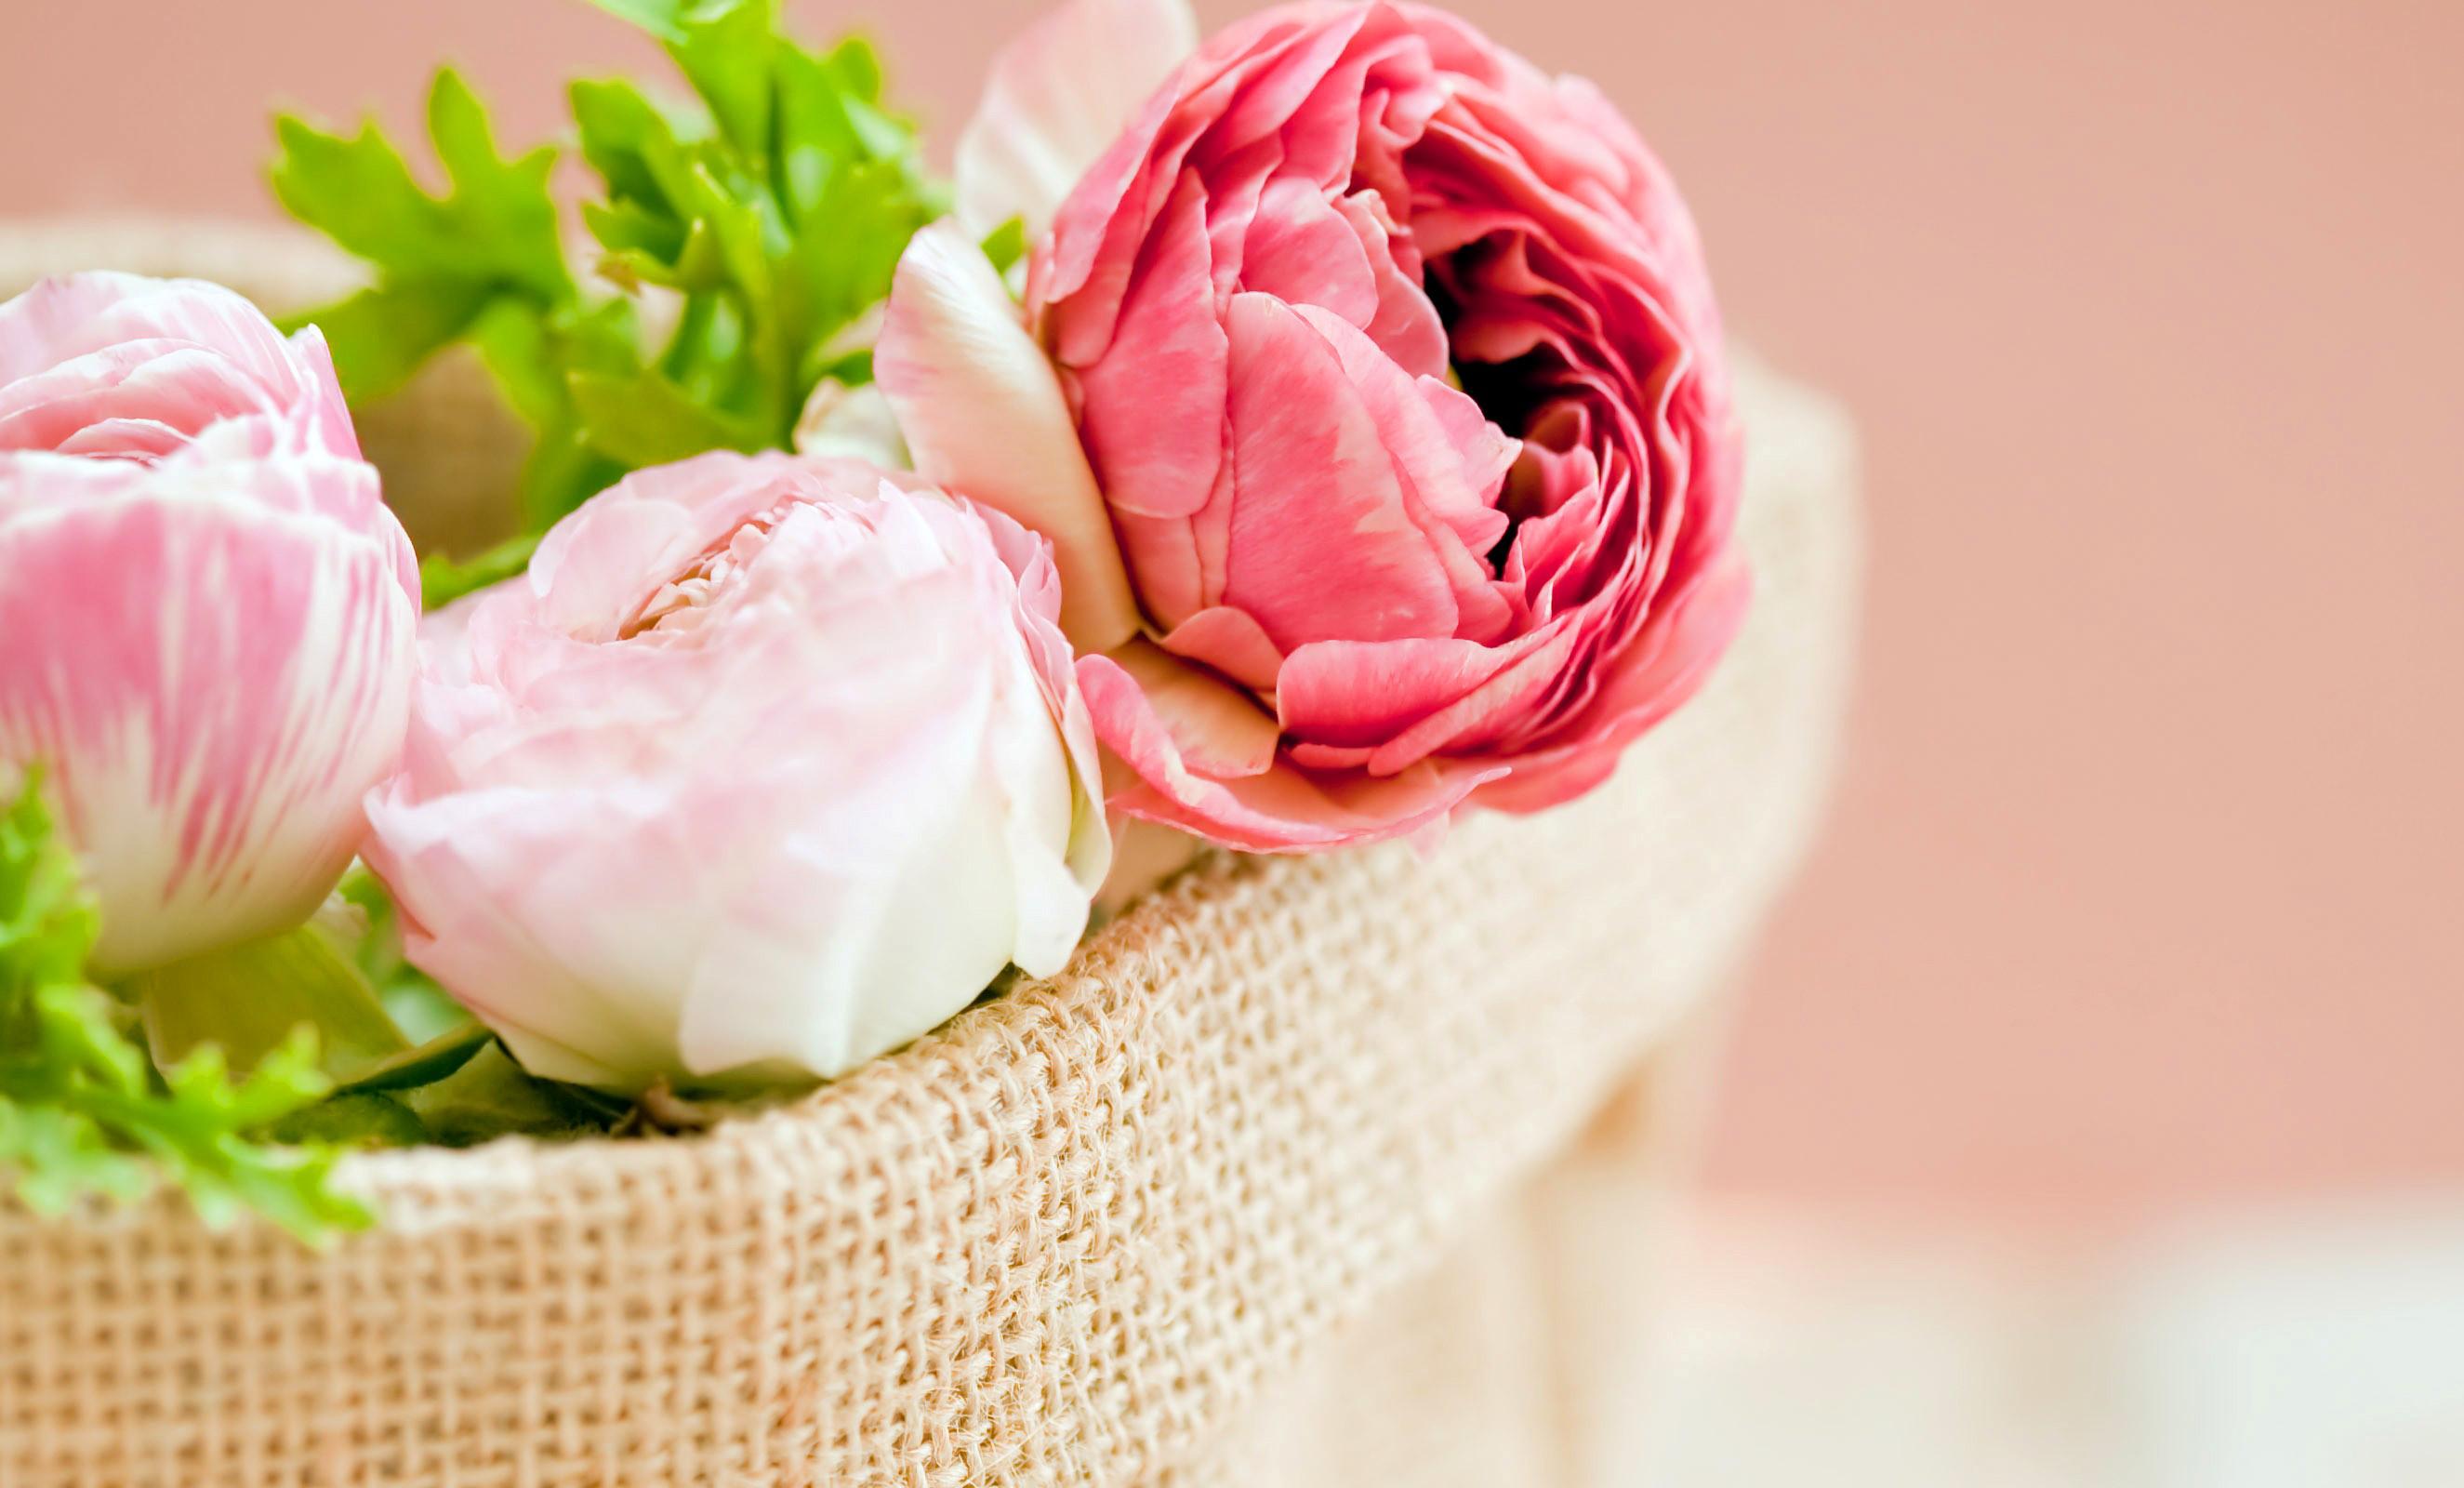 Peonies Pink color Flowers bokeh wallpaper | .